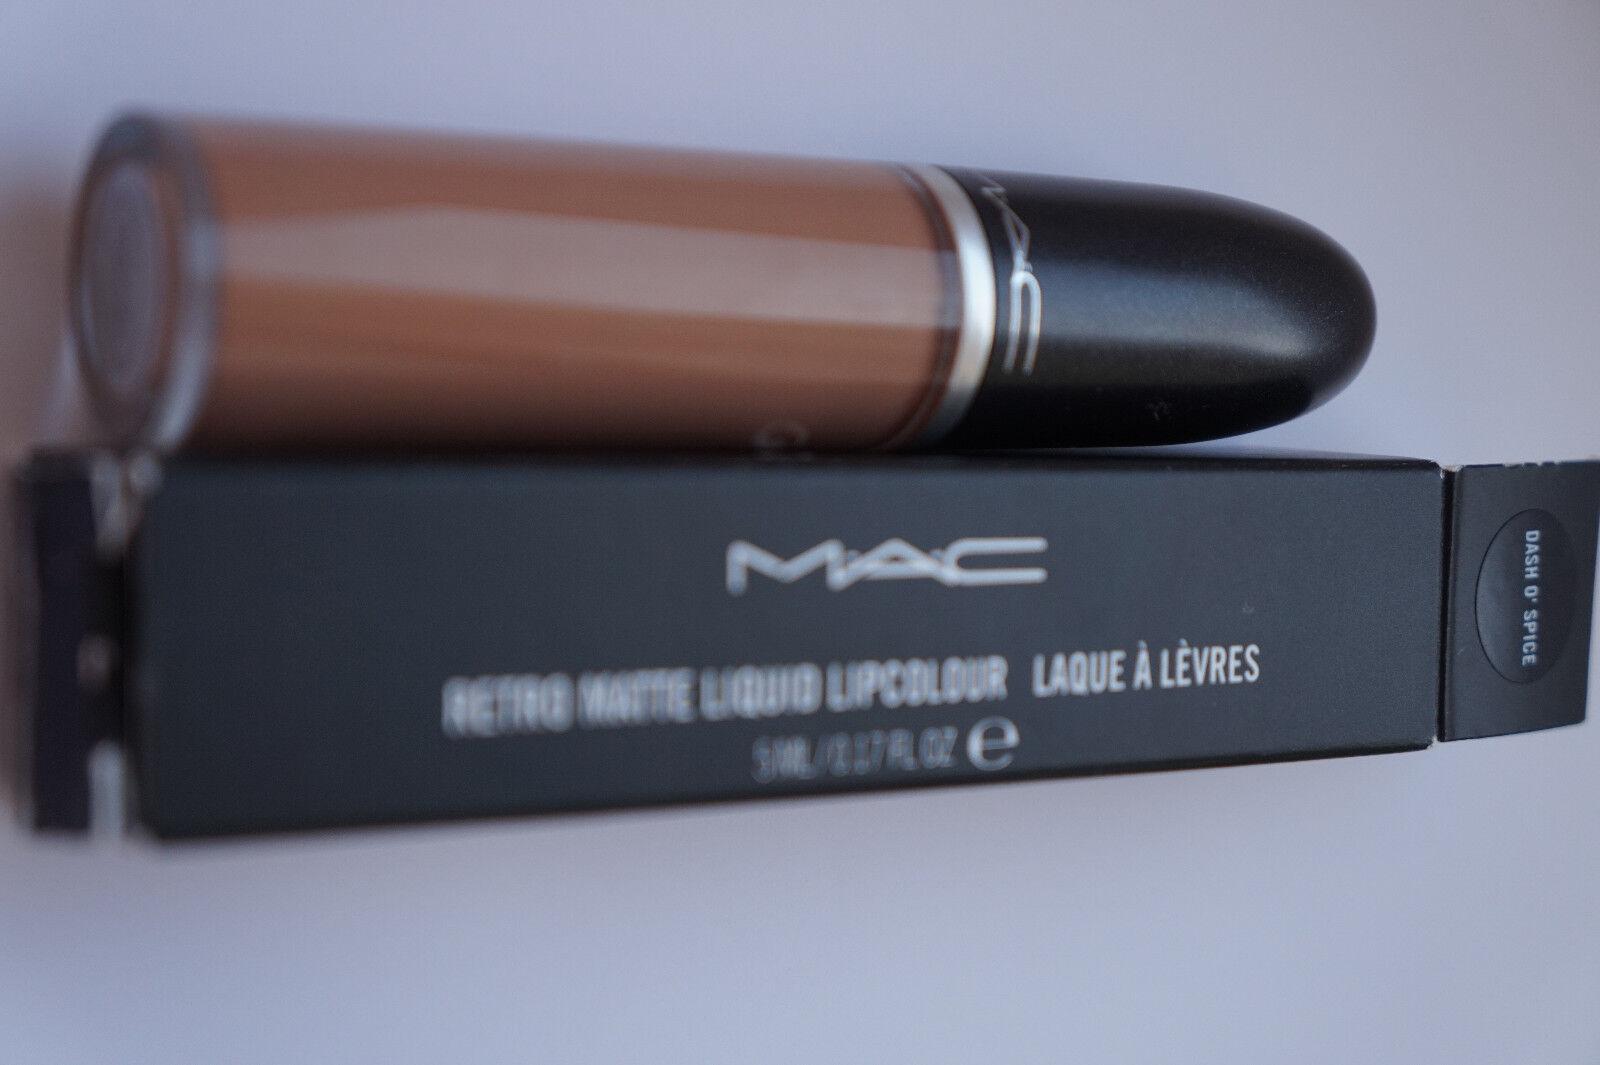 Mac Lippenstift Lipstick  Matte  retro matt DASH O SPICE Kylie Jenner  braun OVP